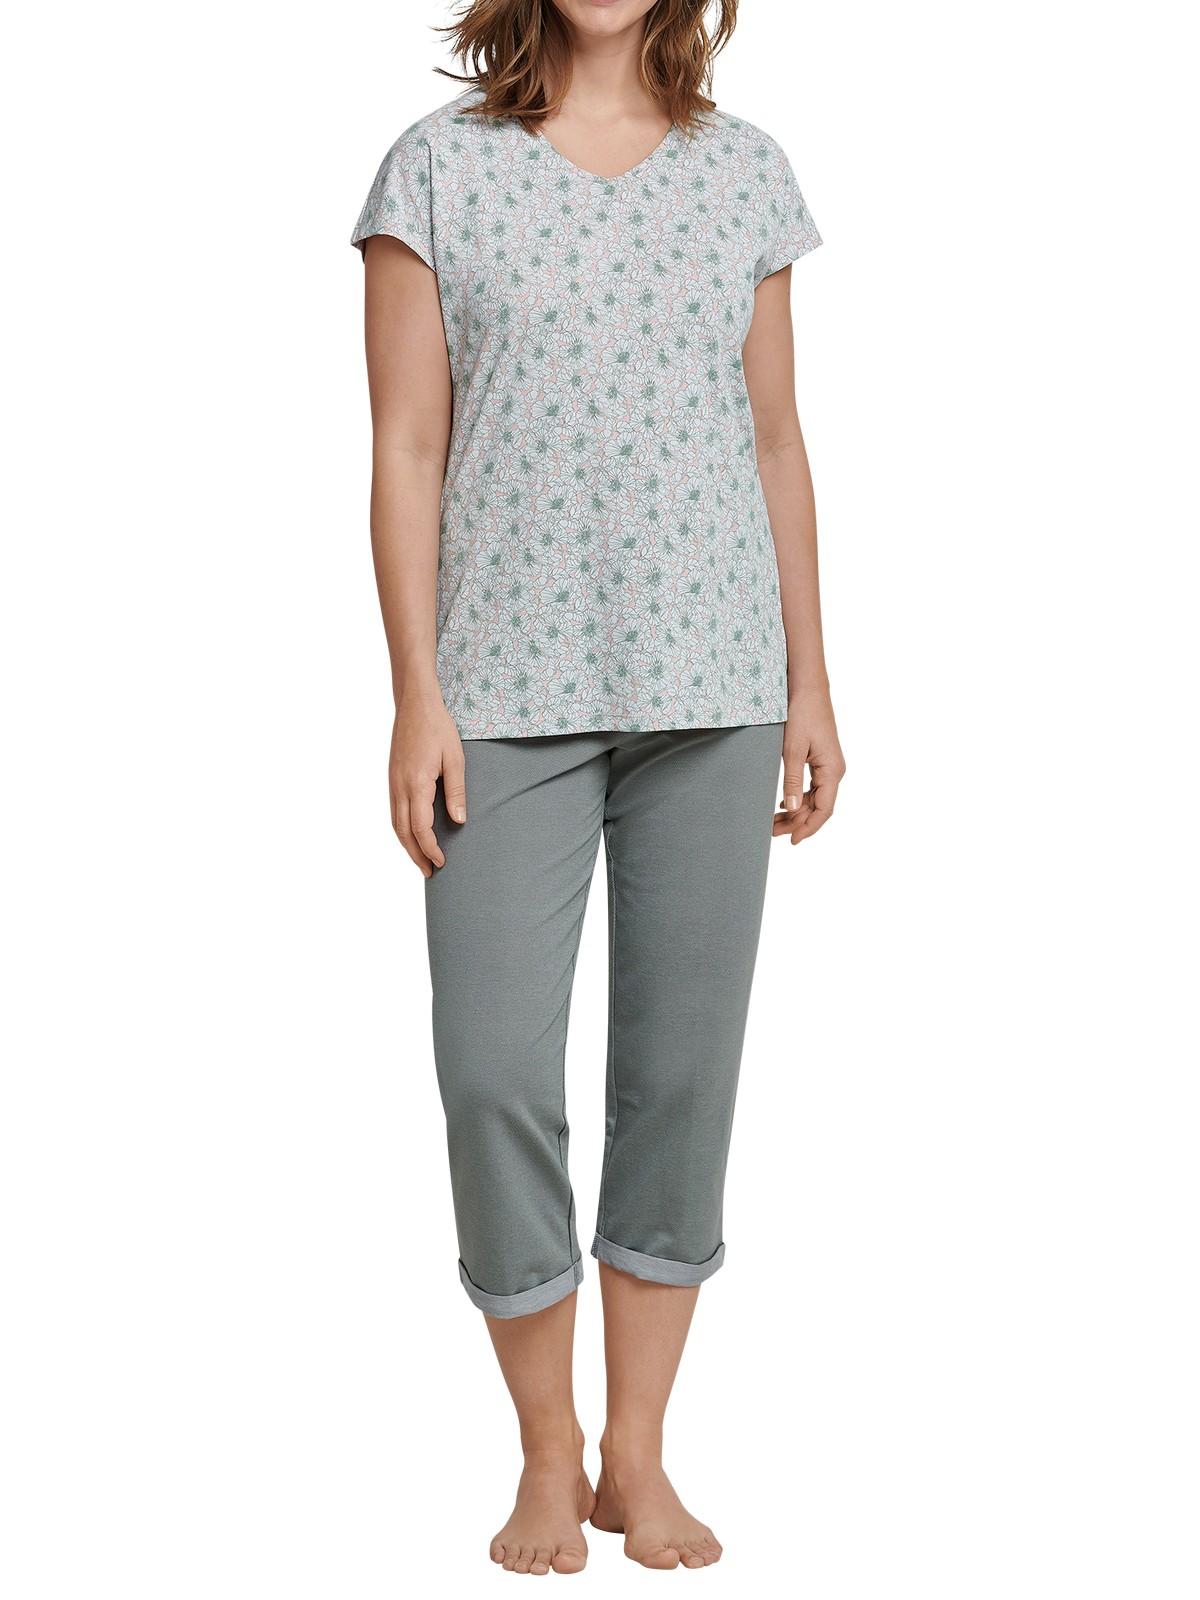 pick up 1d3e3 17109 Seidensticker Damen Schlafanzug Pyjama Anzug 3/4 Lang - 166271 | KAPS -  Wäsche & mehr - Schiesser - Marc O'Polo - Seidensticker - Lacoste